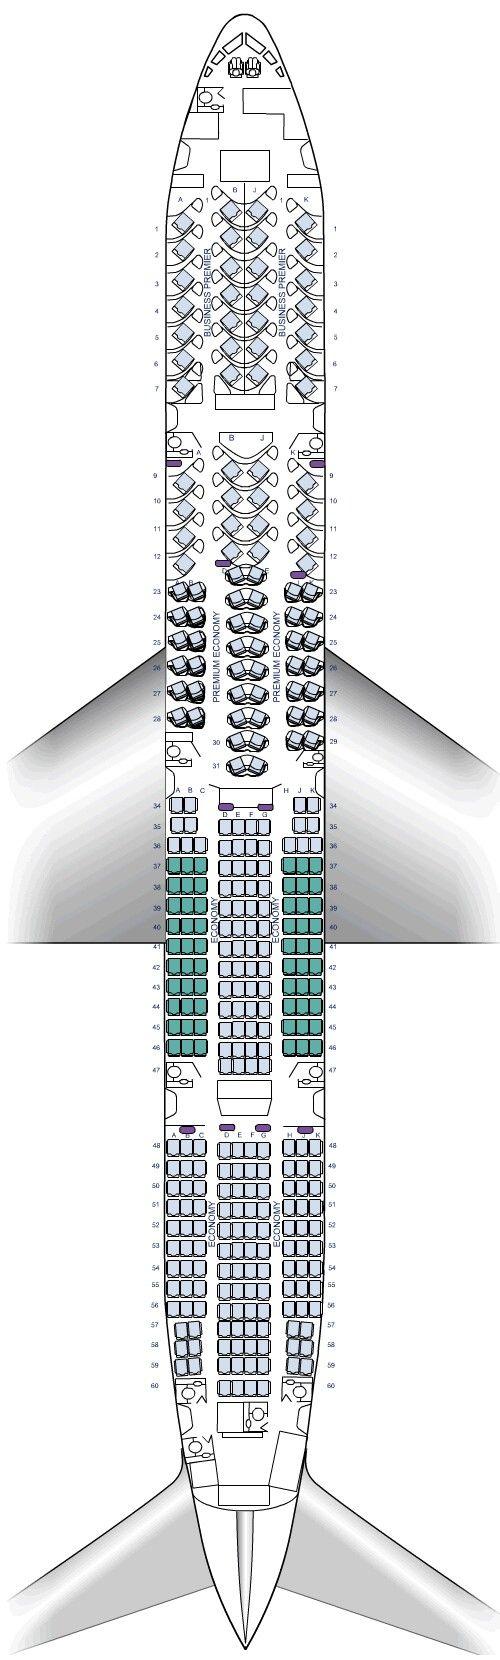 Air New Zealand 777-300ER seating plan October 2013